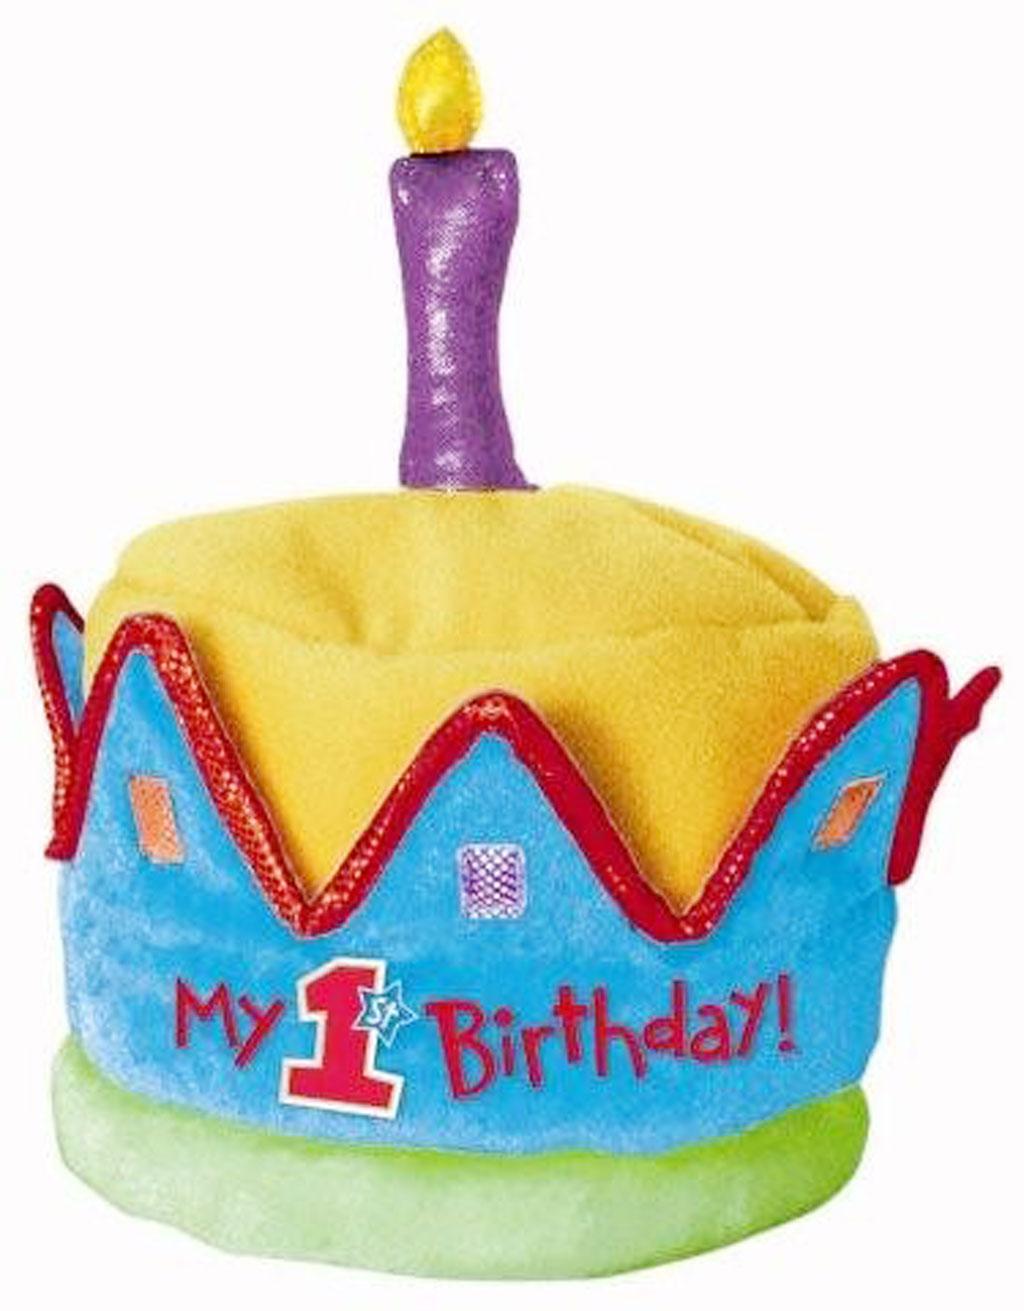 Leapfrog Birthday Cake Canada Birthday Cake Cake Ideas By Prayface